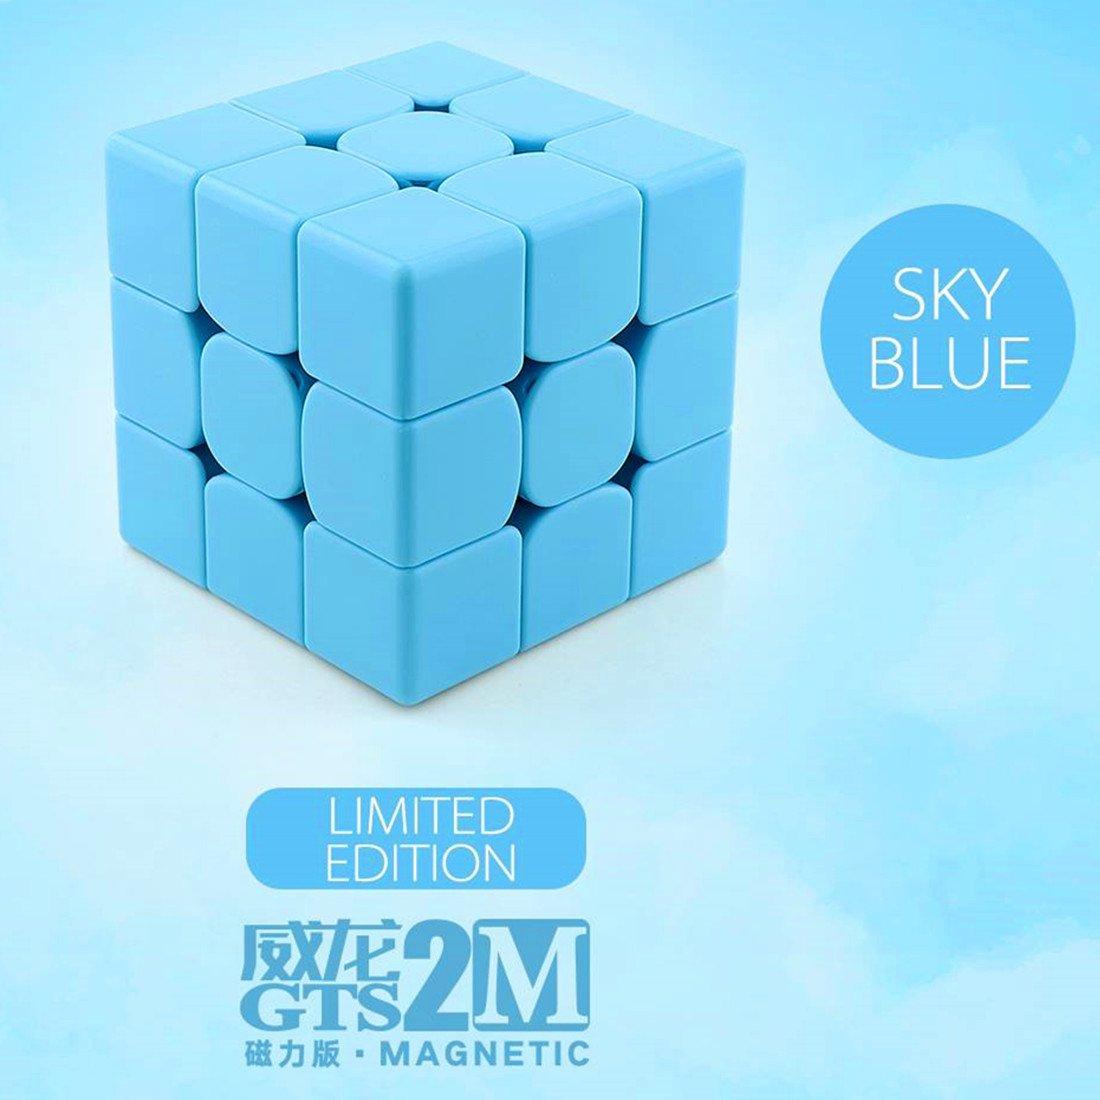 CuberSpeed MoYu WeiLong GTS2 M Blue 3x3 Magic cube magnetic MoYu WeiLong GTS V2 magnetic blue 3x3x3 Speed cube Puzzle